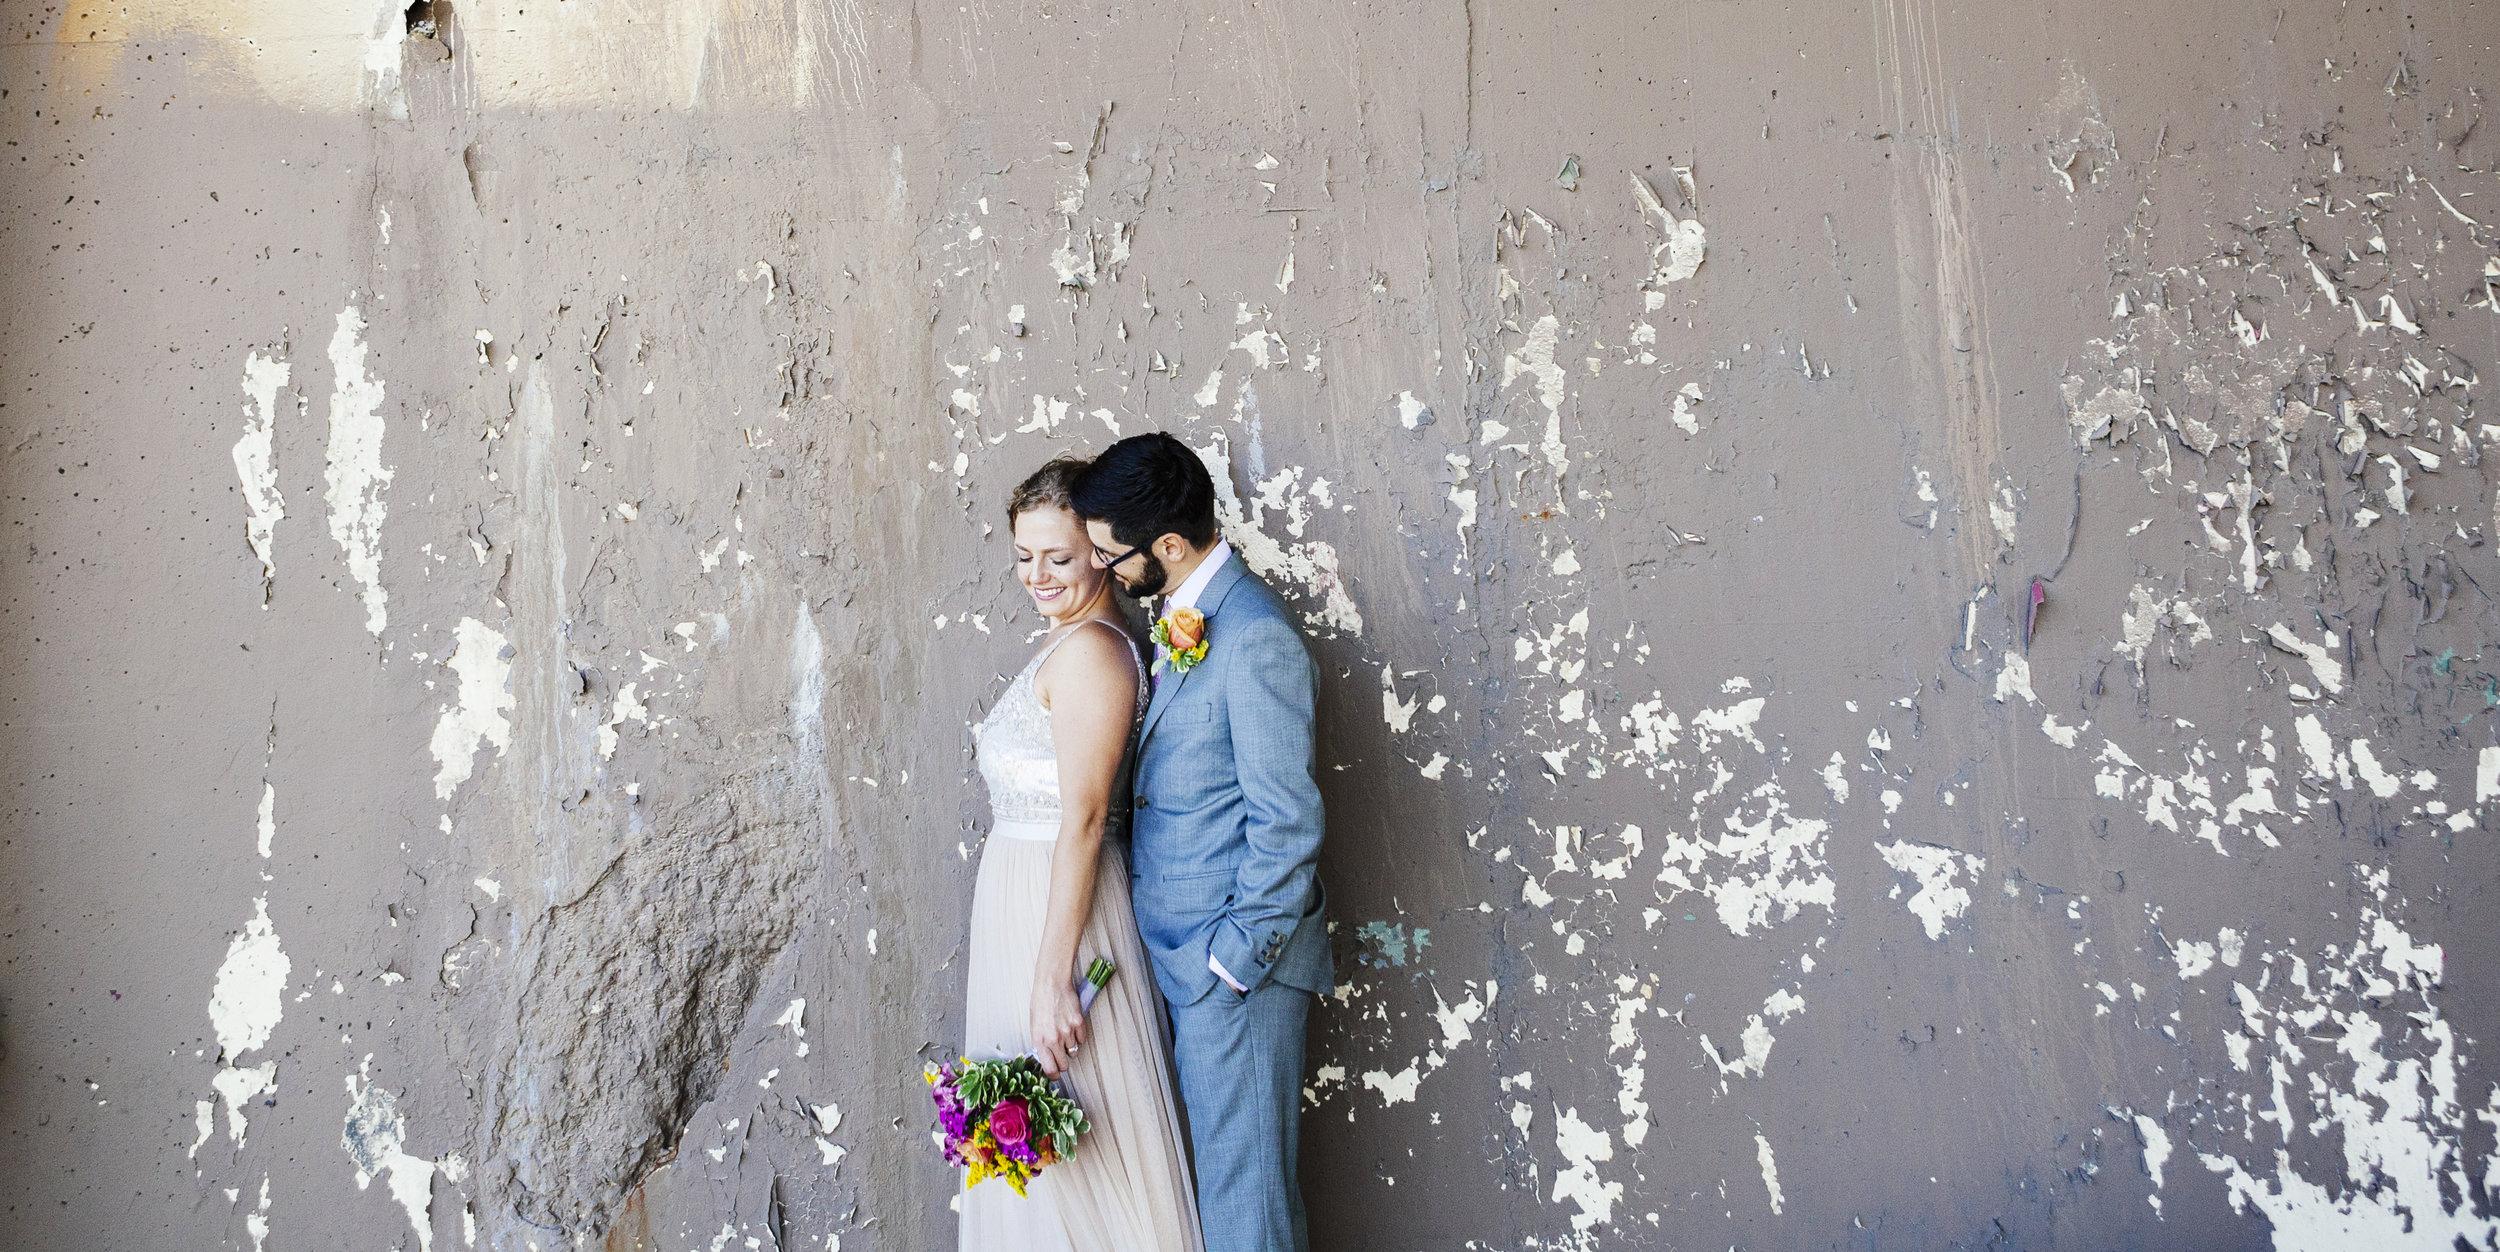 iluvphoto_Weddings_95_2.jpg